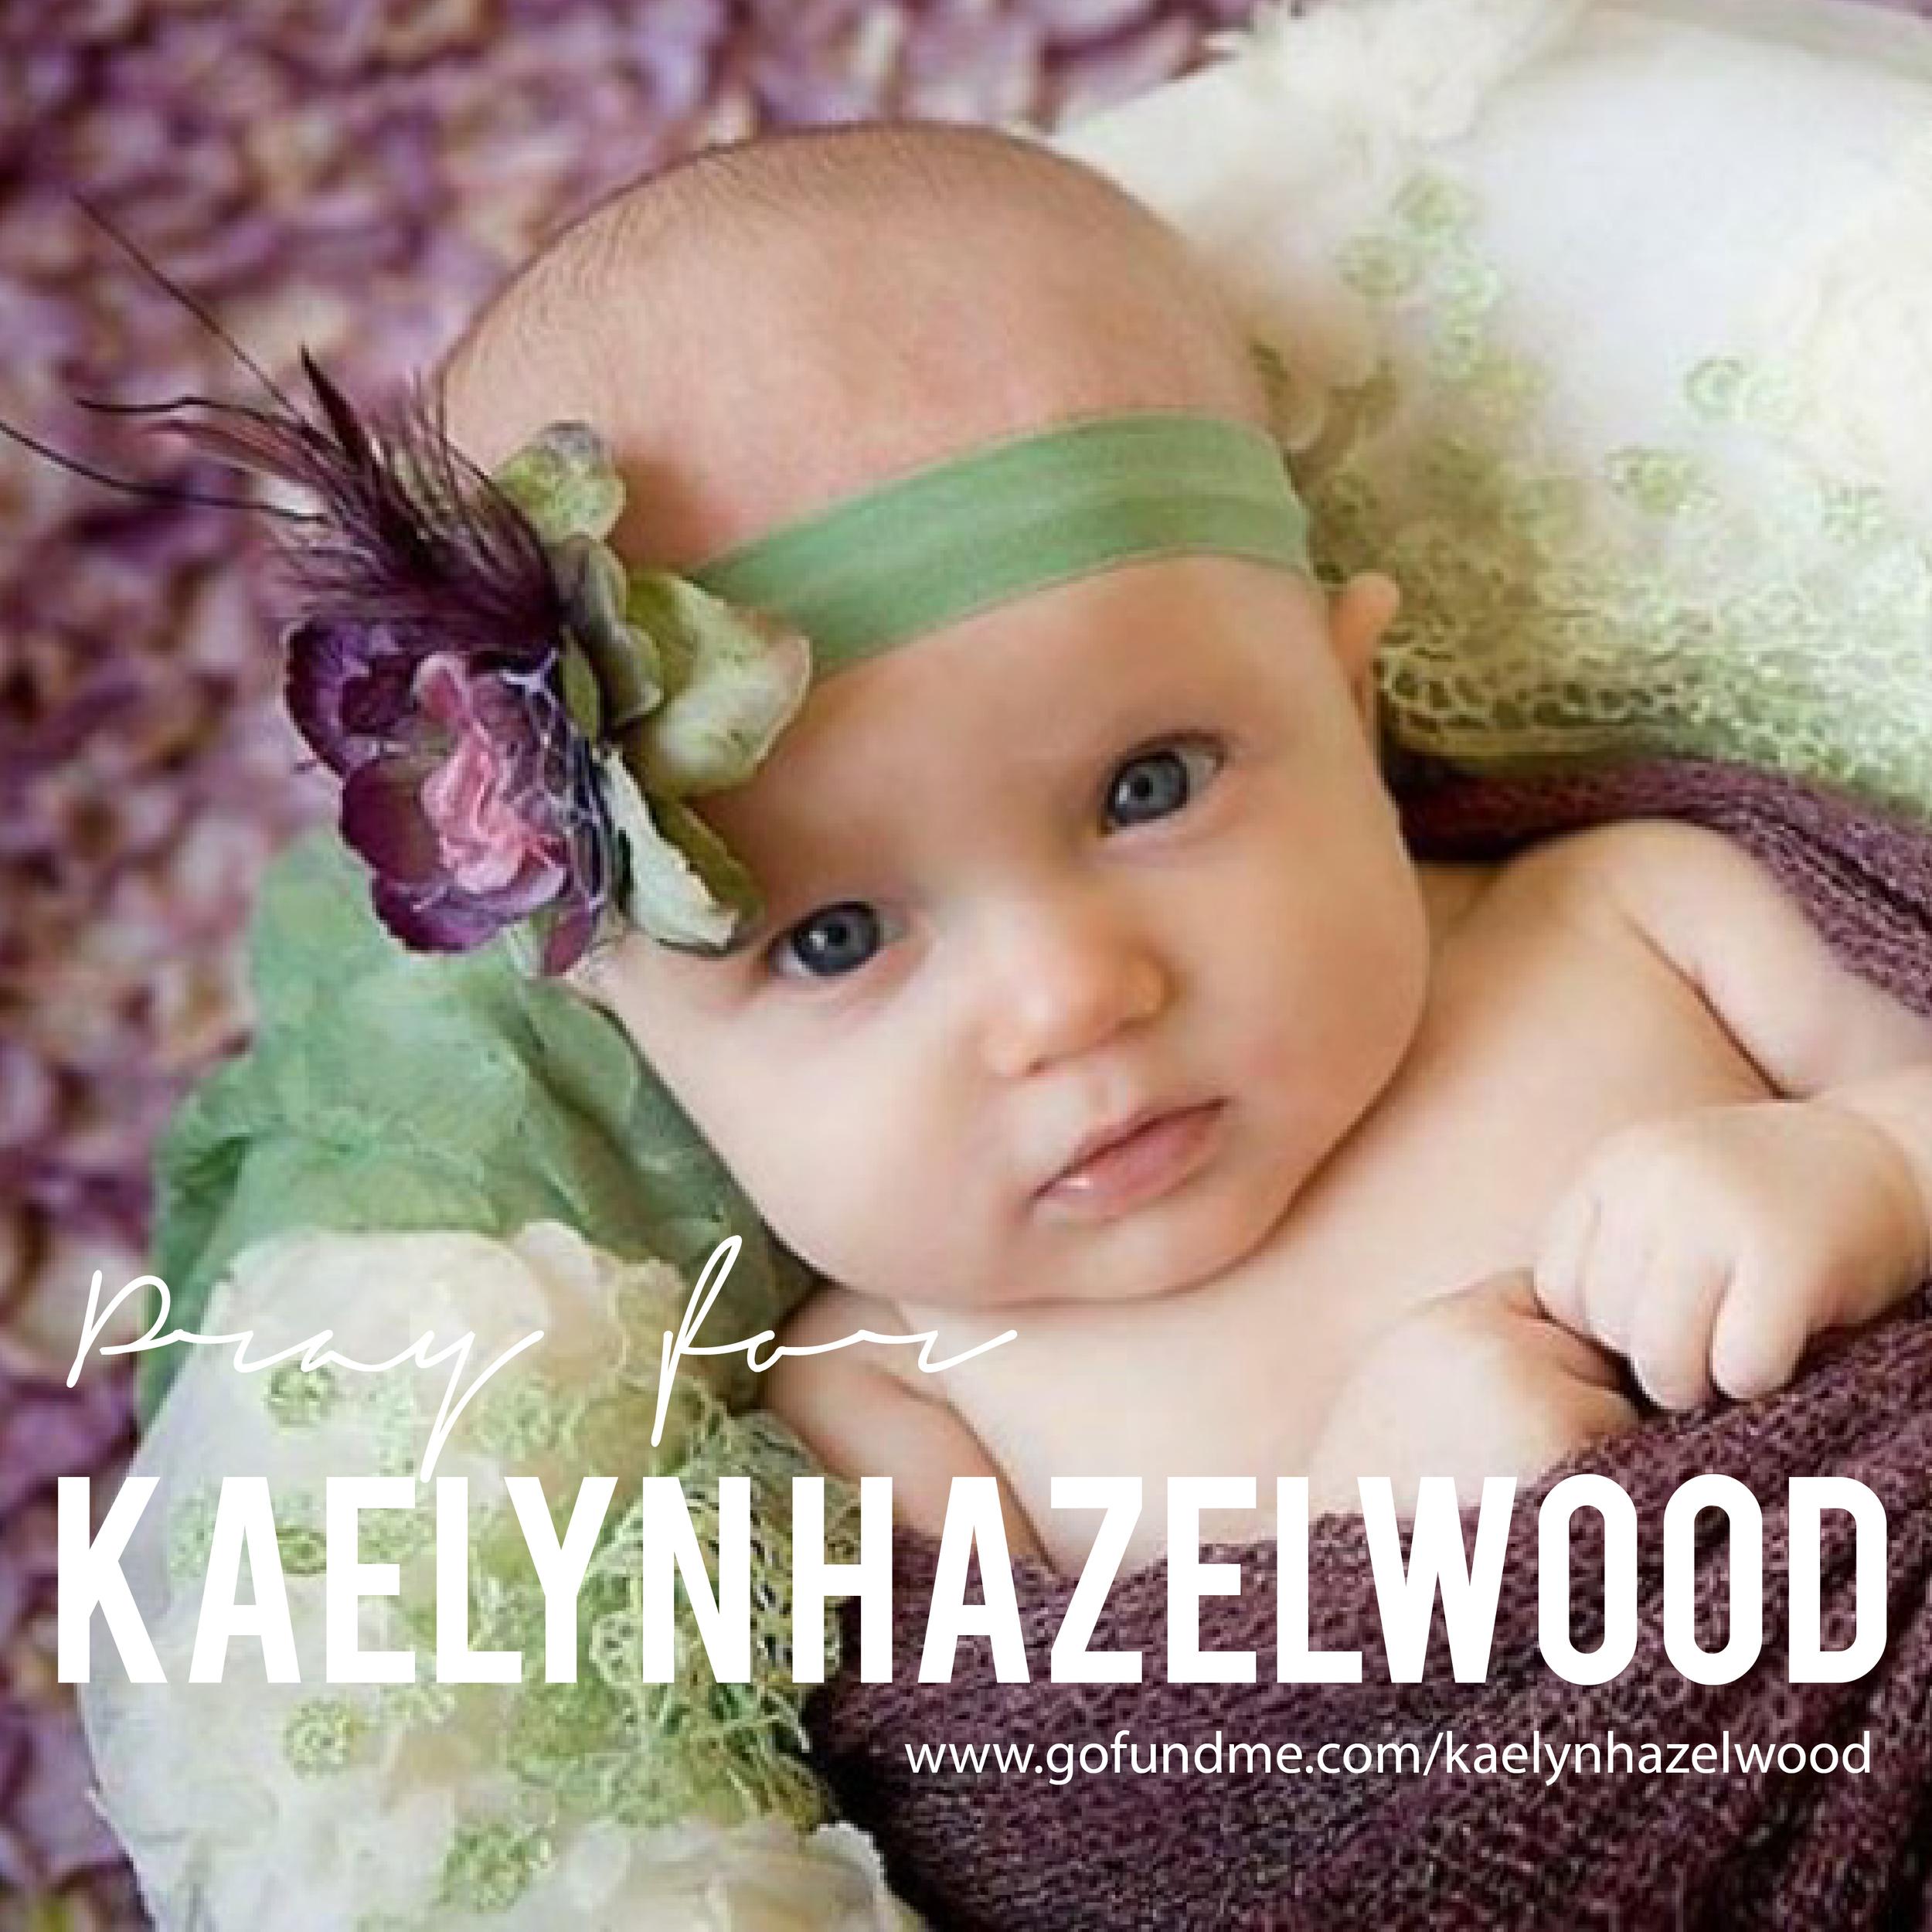 pray for kaelyn hazelwood